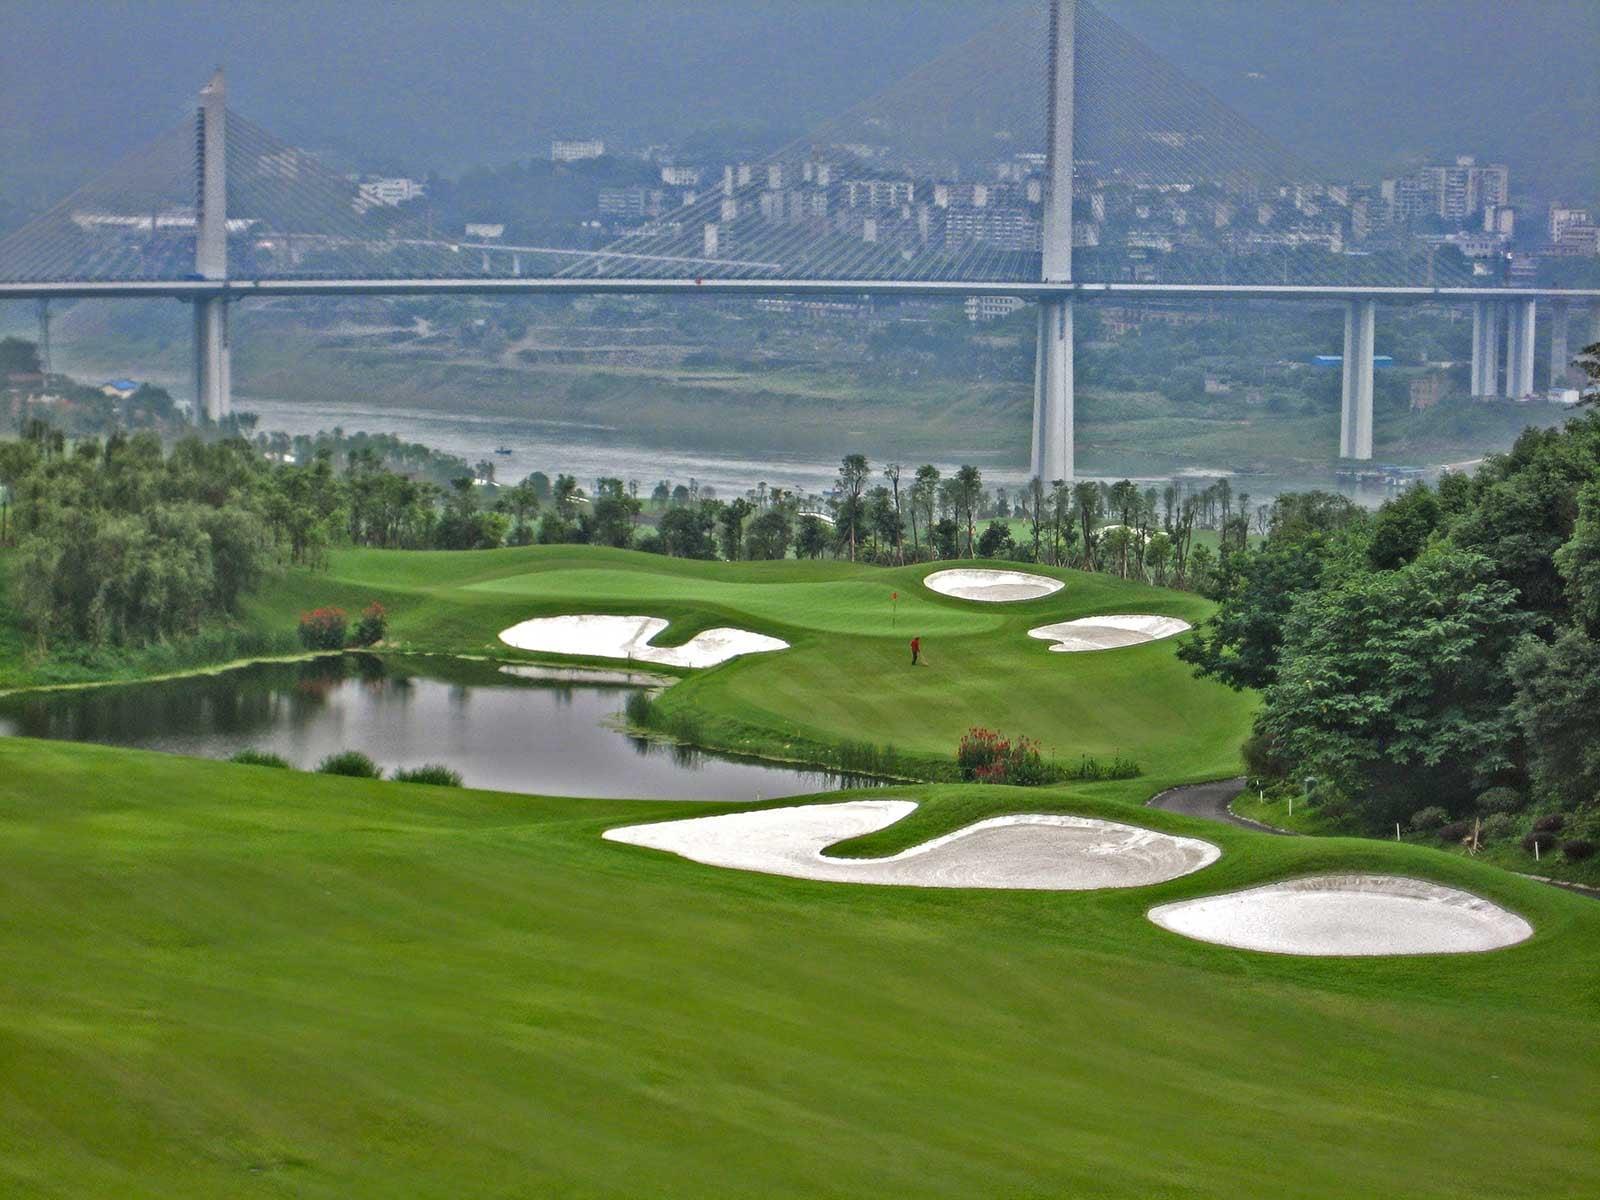 chongqing-riverview_golf-course.jpg